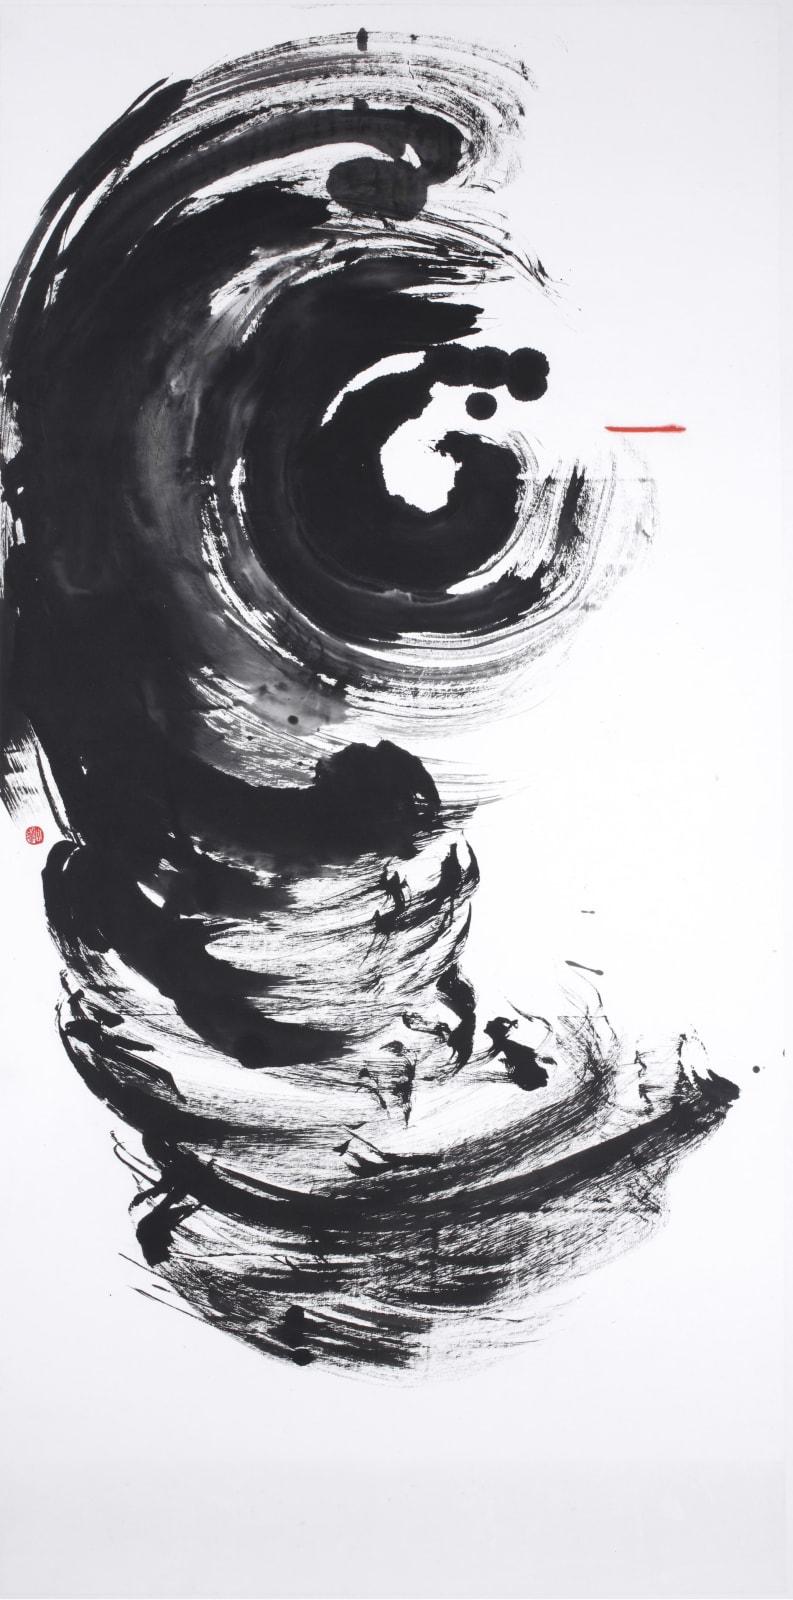 Chou Lu Yun, Irene 周綠雲, Contemplation 冥想, 1970-1980